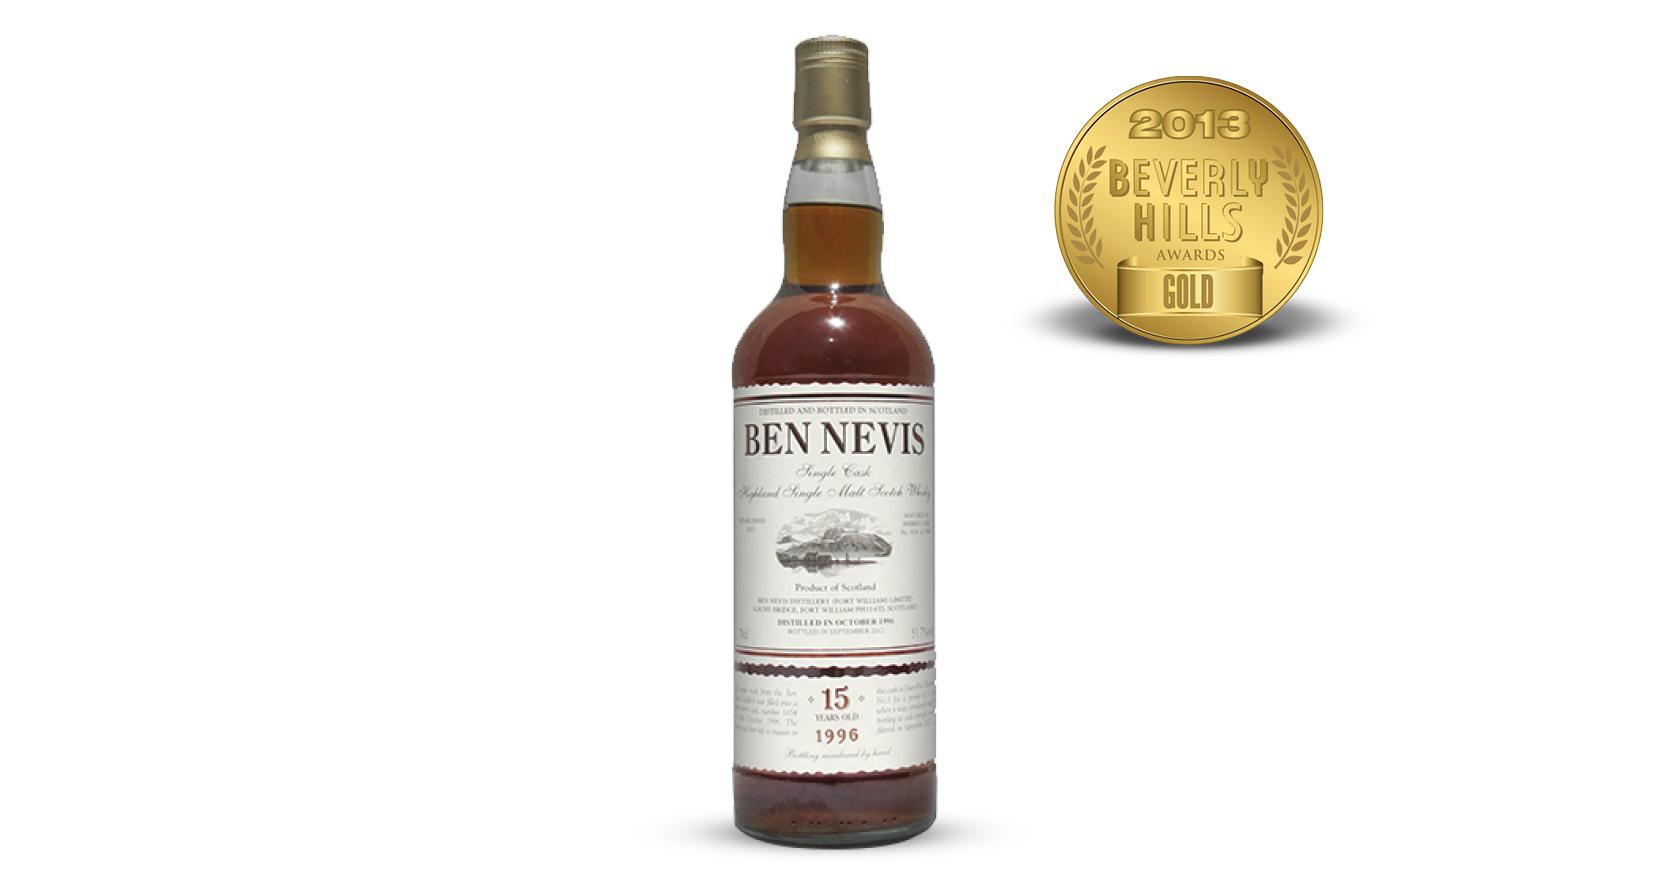 Ben Nevis 15 year Single Malt Scotch Whisky